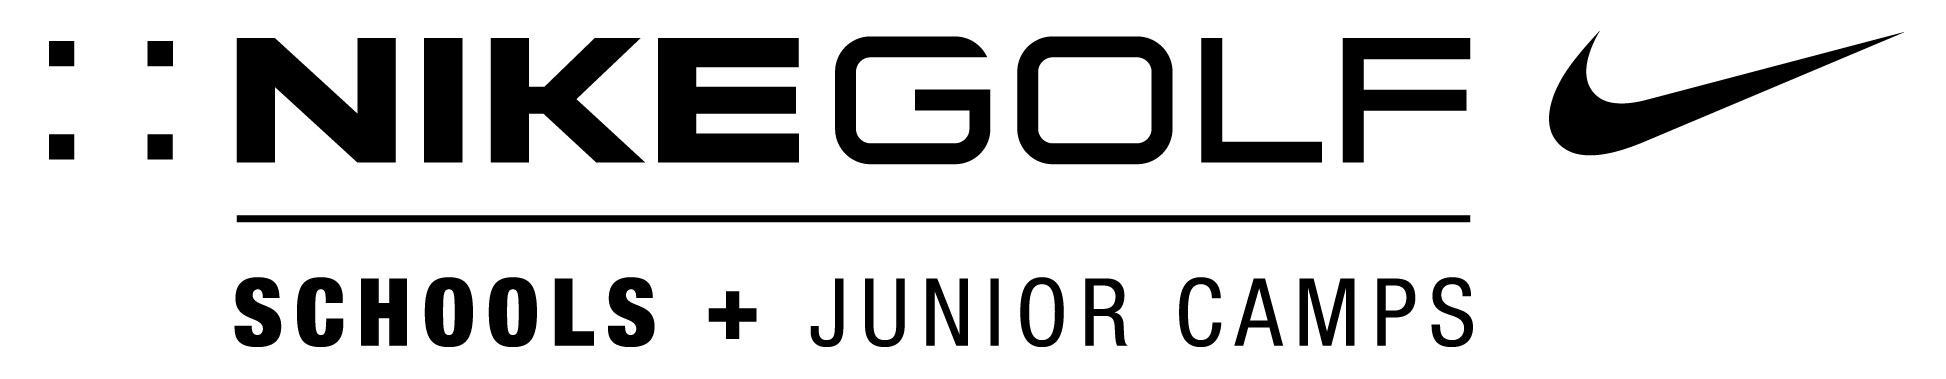 Nike Golf Camps, Beverley Golf and Tennis Club